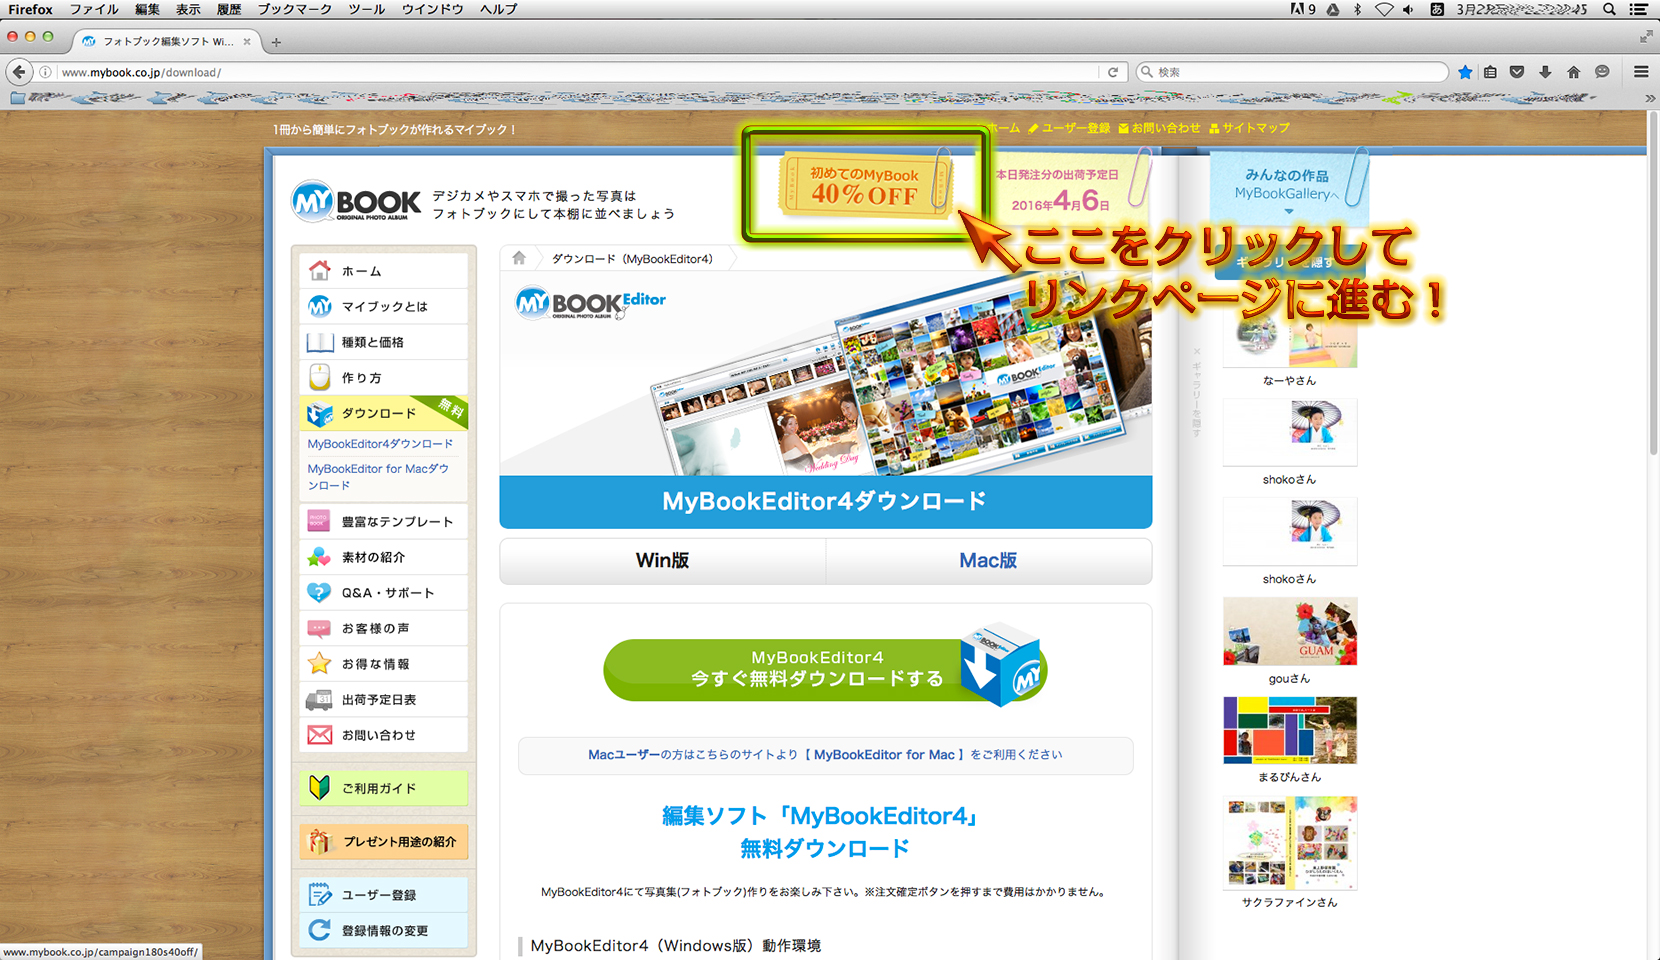 http://moritetsu.info/car/img/mb206-2016-03-29-22-10-45.jpg